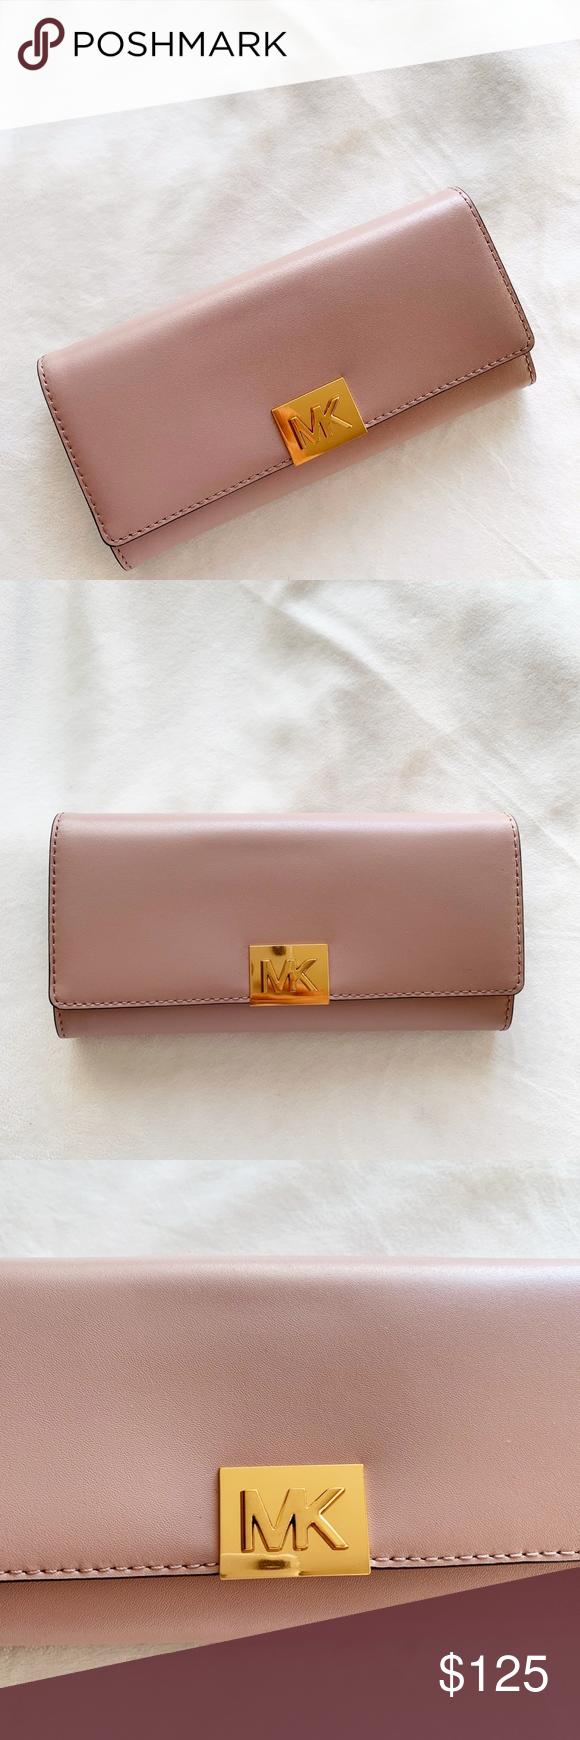 b23faef9f5bb Michael Kors Carryall Mindy Leather Wallet Michael Kors Mindy Carryall  Leather Signature PVC Flap Clutch Wallet